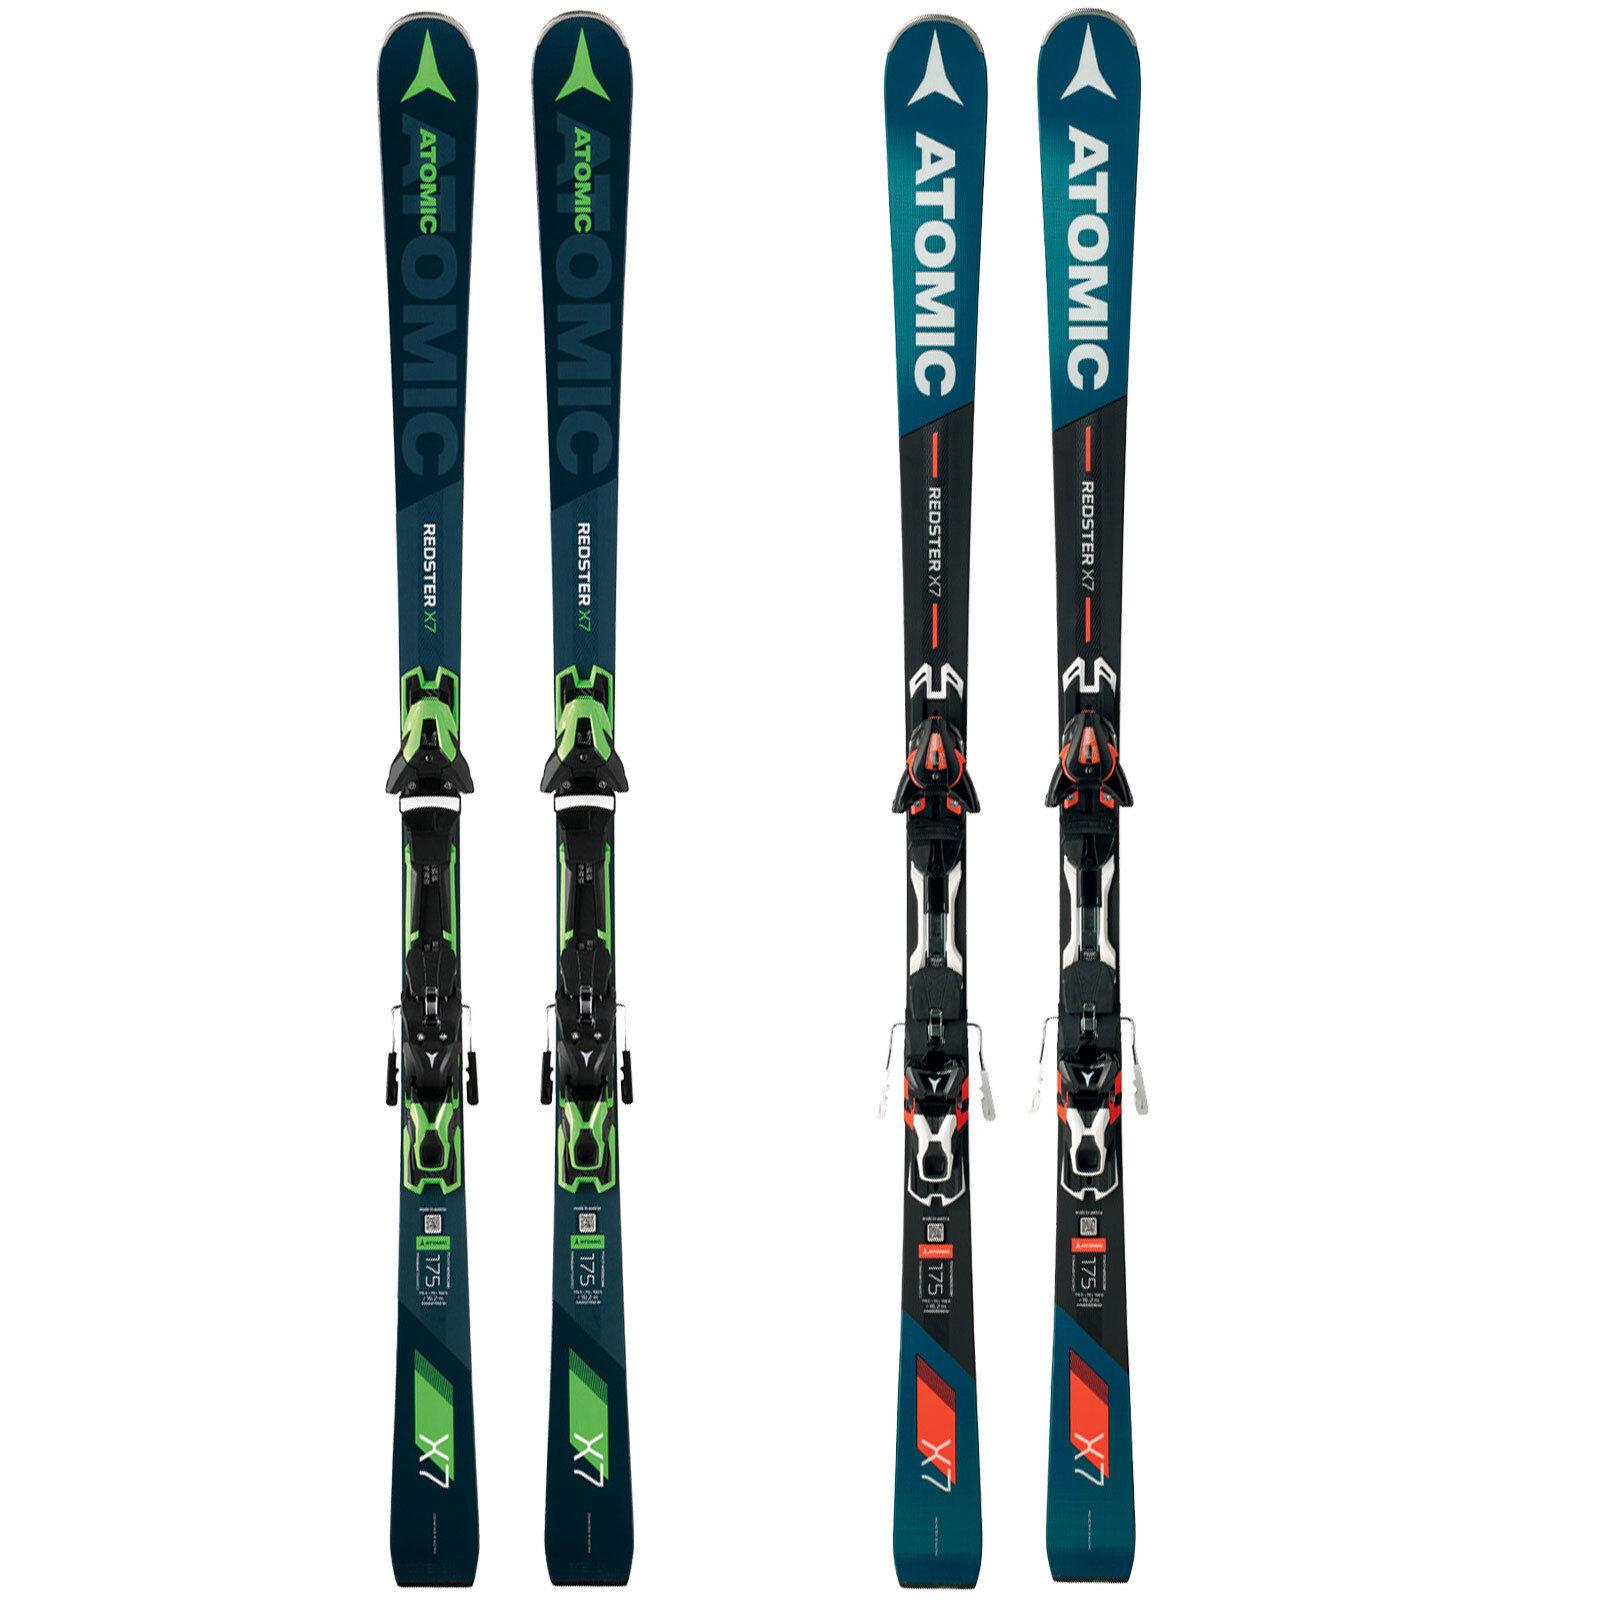 Atomic ROTster X7 Ski + FT 12 GW Bindung Herren-Pistenski Race Skiset Ski-Set